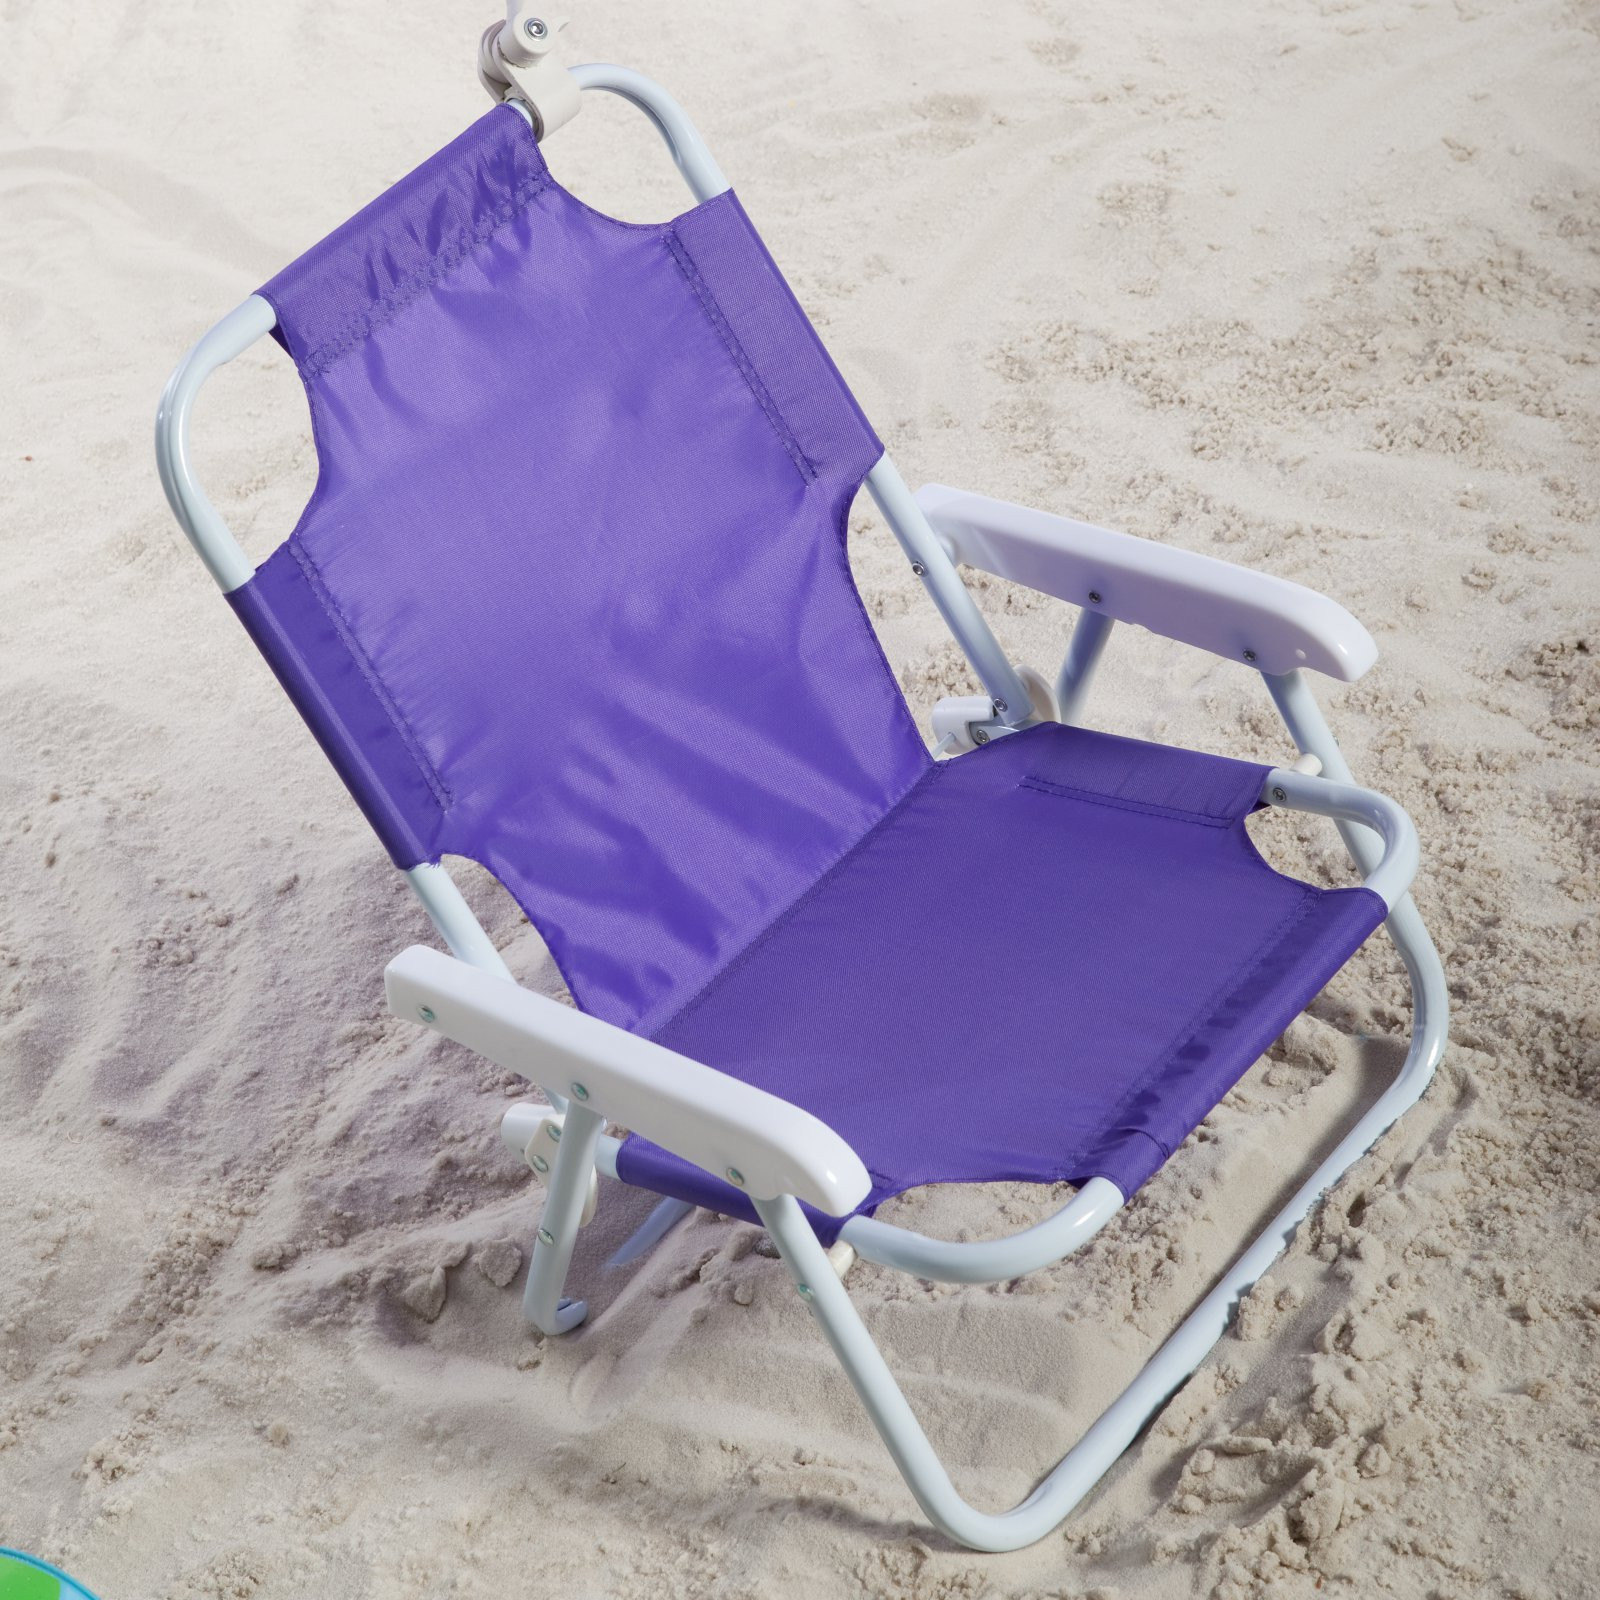 Kids Beach Chair With Umbrella  Kids Beach Chair & Umbrella Walmart Walmart